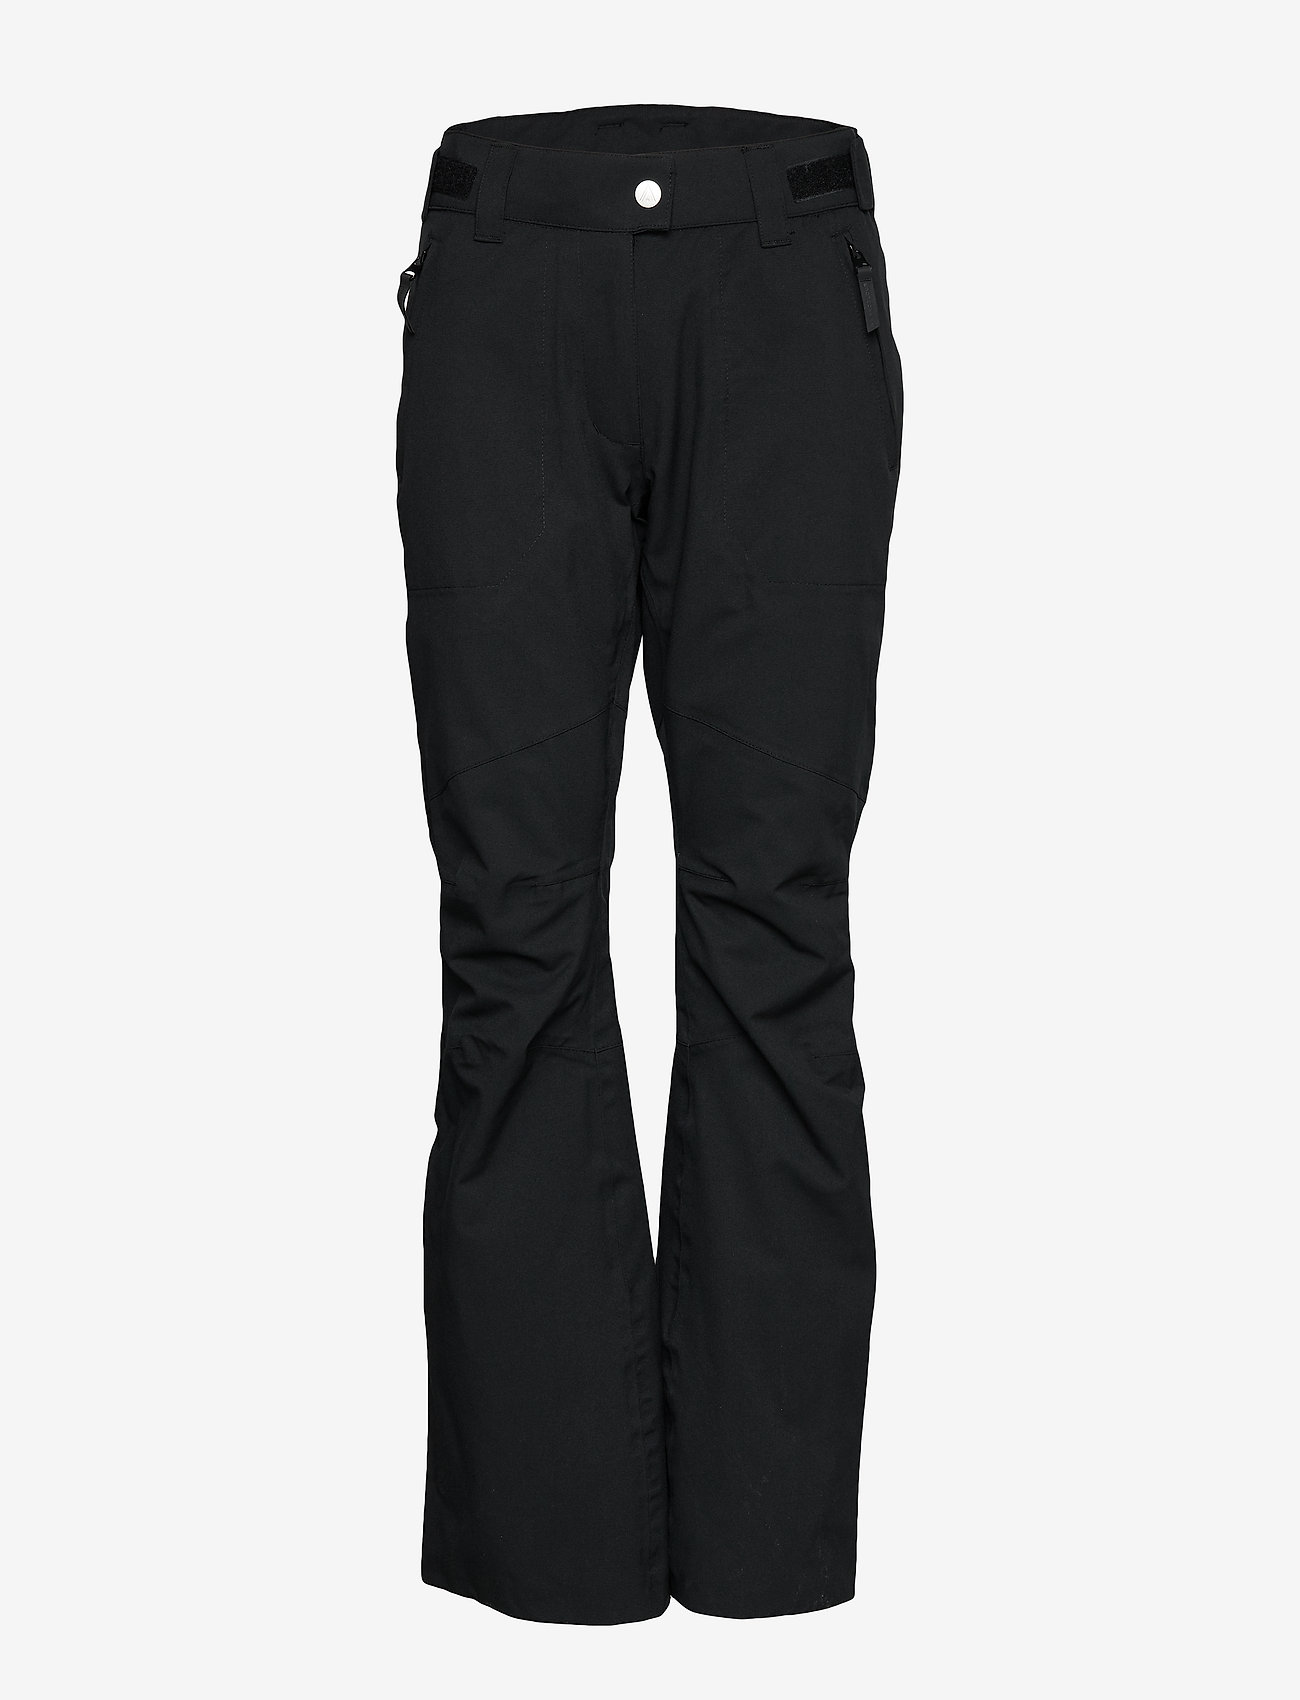 WearColour - BLAZE Pant - skibukser - black - 0